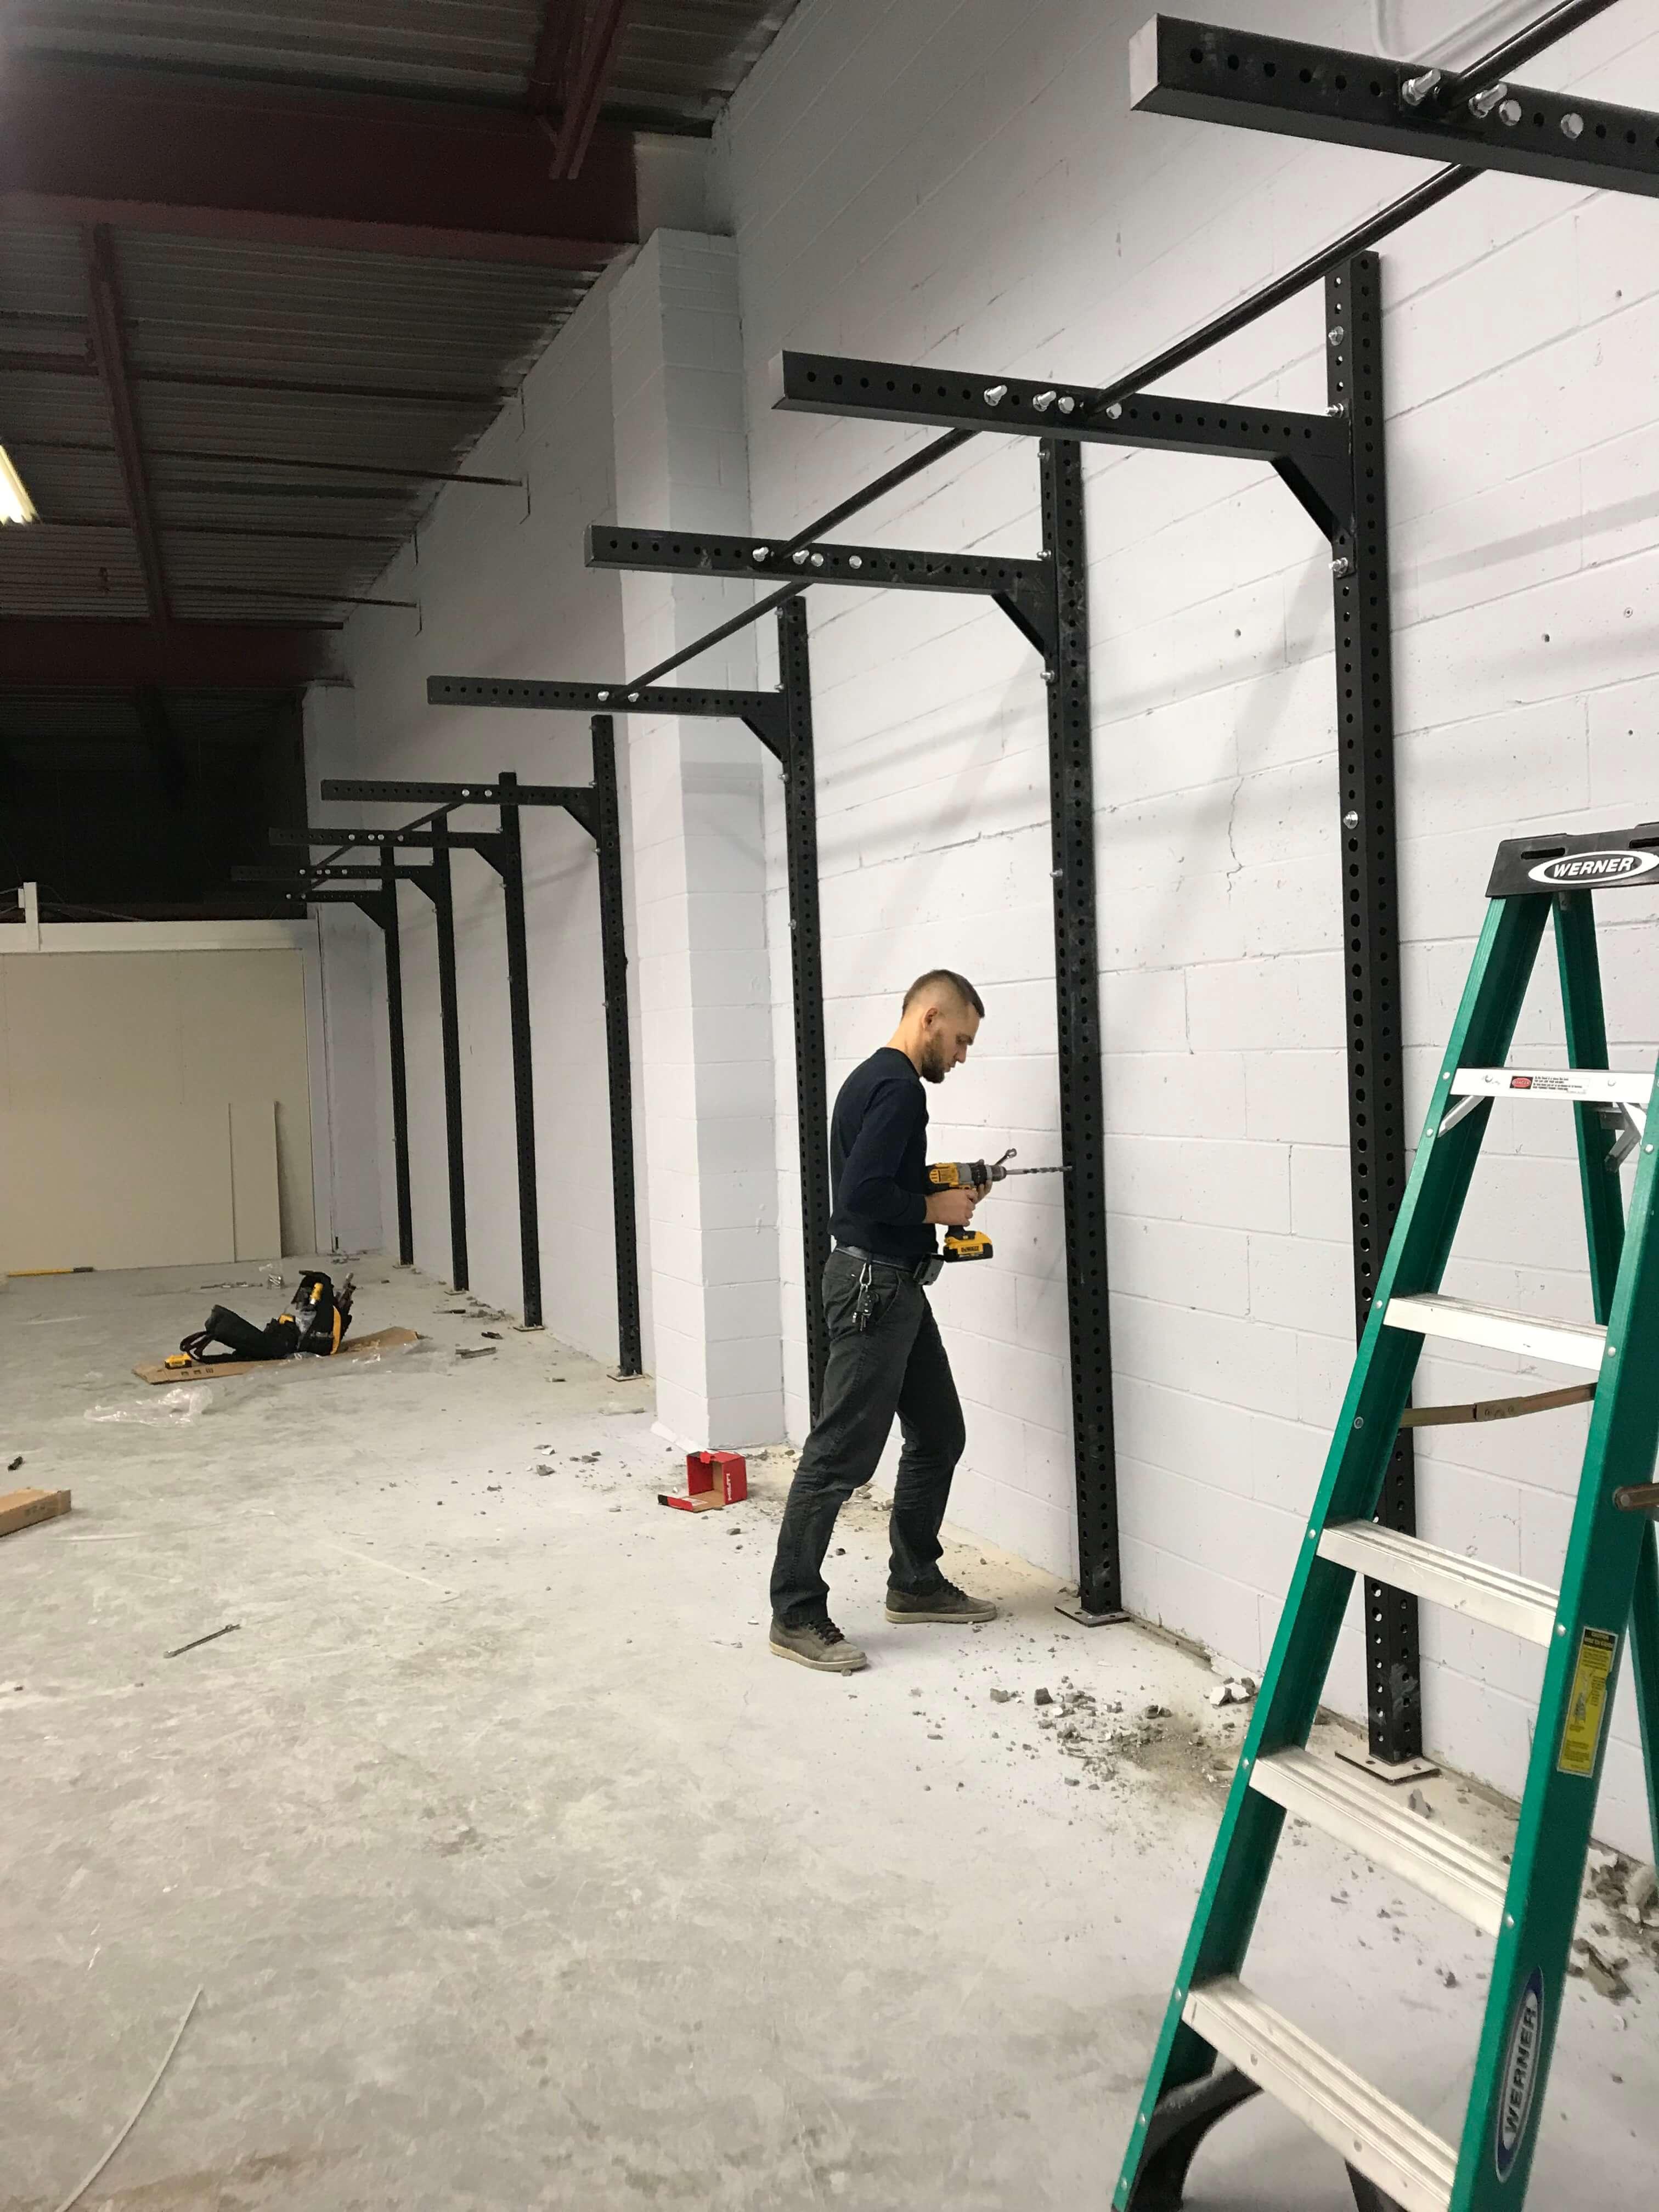 sport equipment on wall installation 2